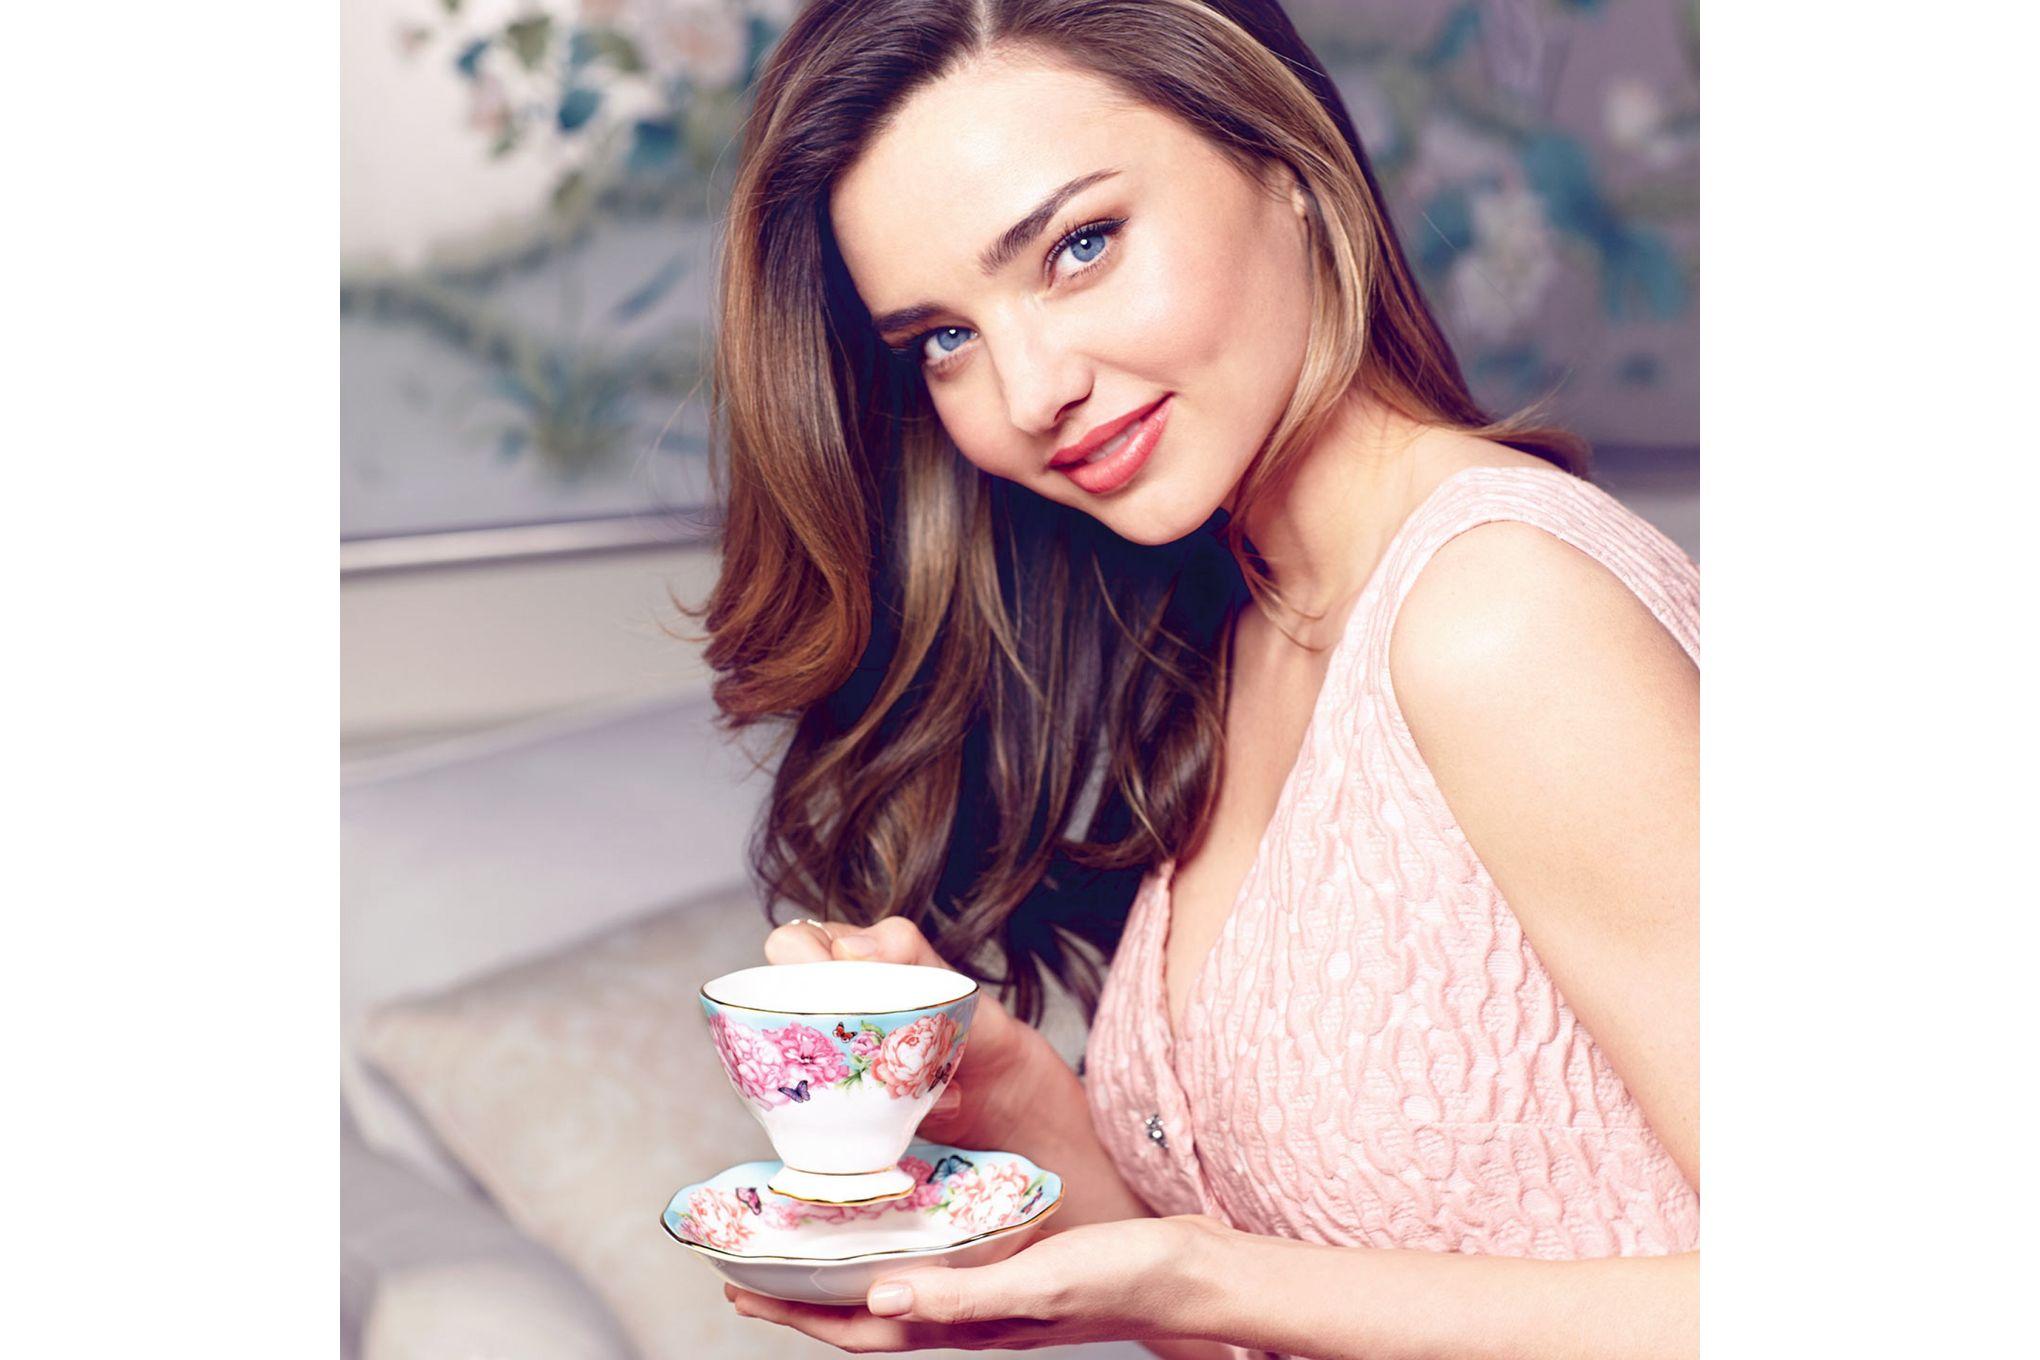 Miranda Kerr for Royal Albert Devotion 3 Piece Set Teacup, Saucer, Plate 20cm Devotion thumb 4